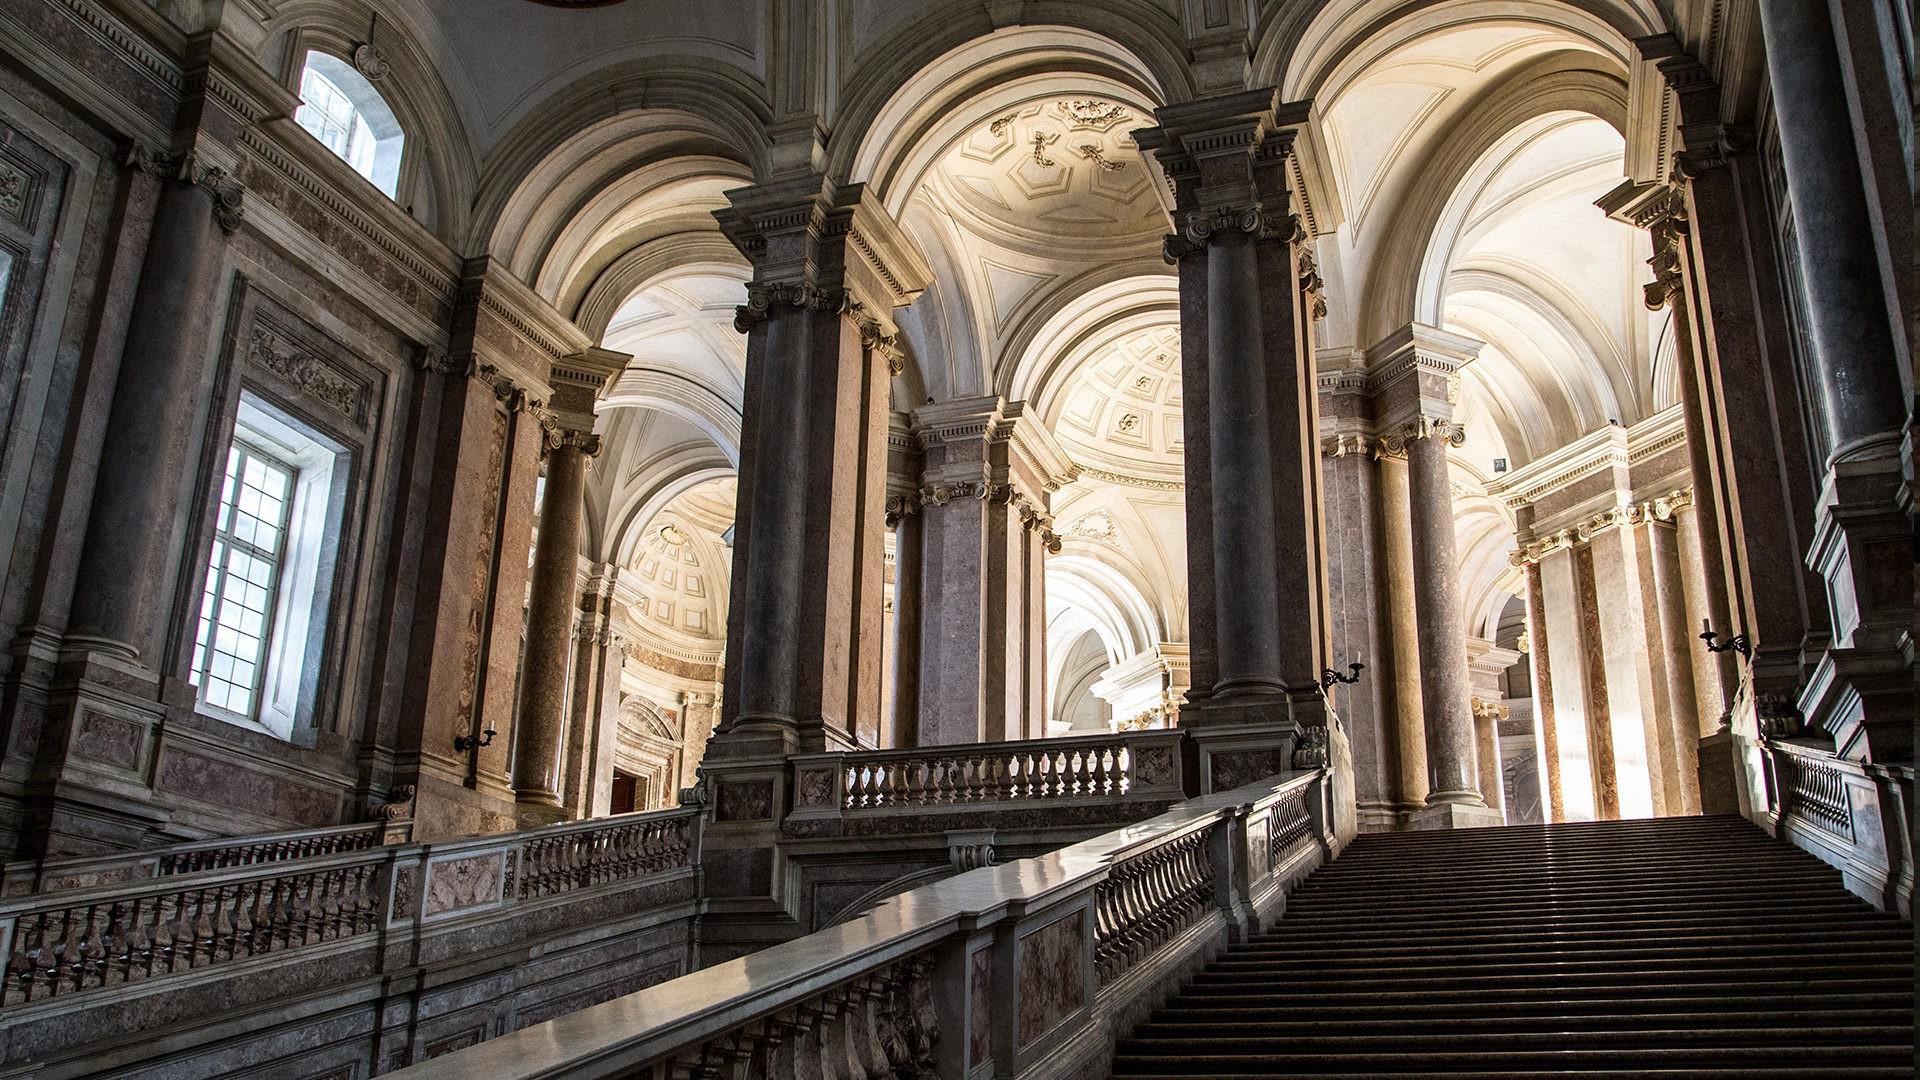 Reggia4 1920x1080 - Palacio Real de Caserta